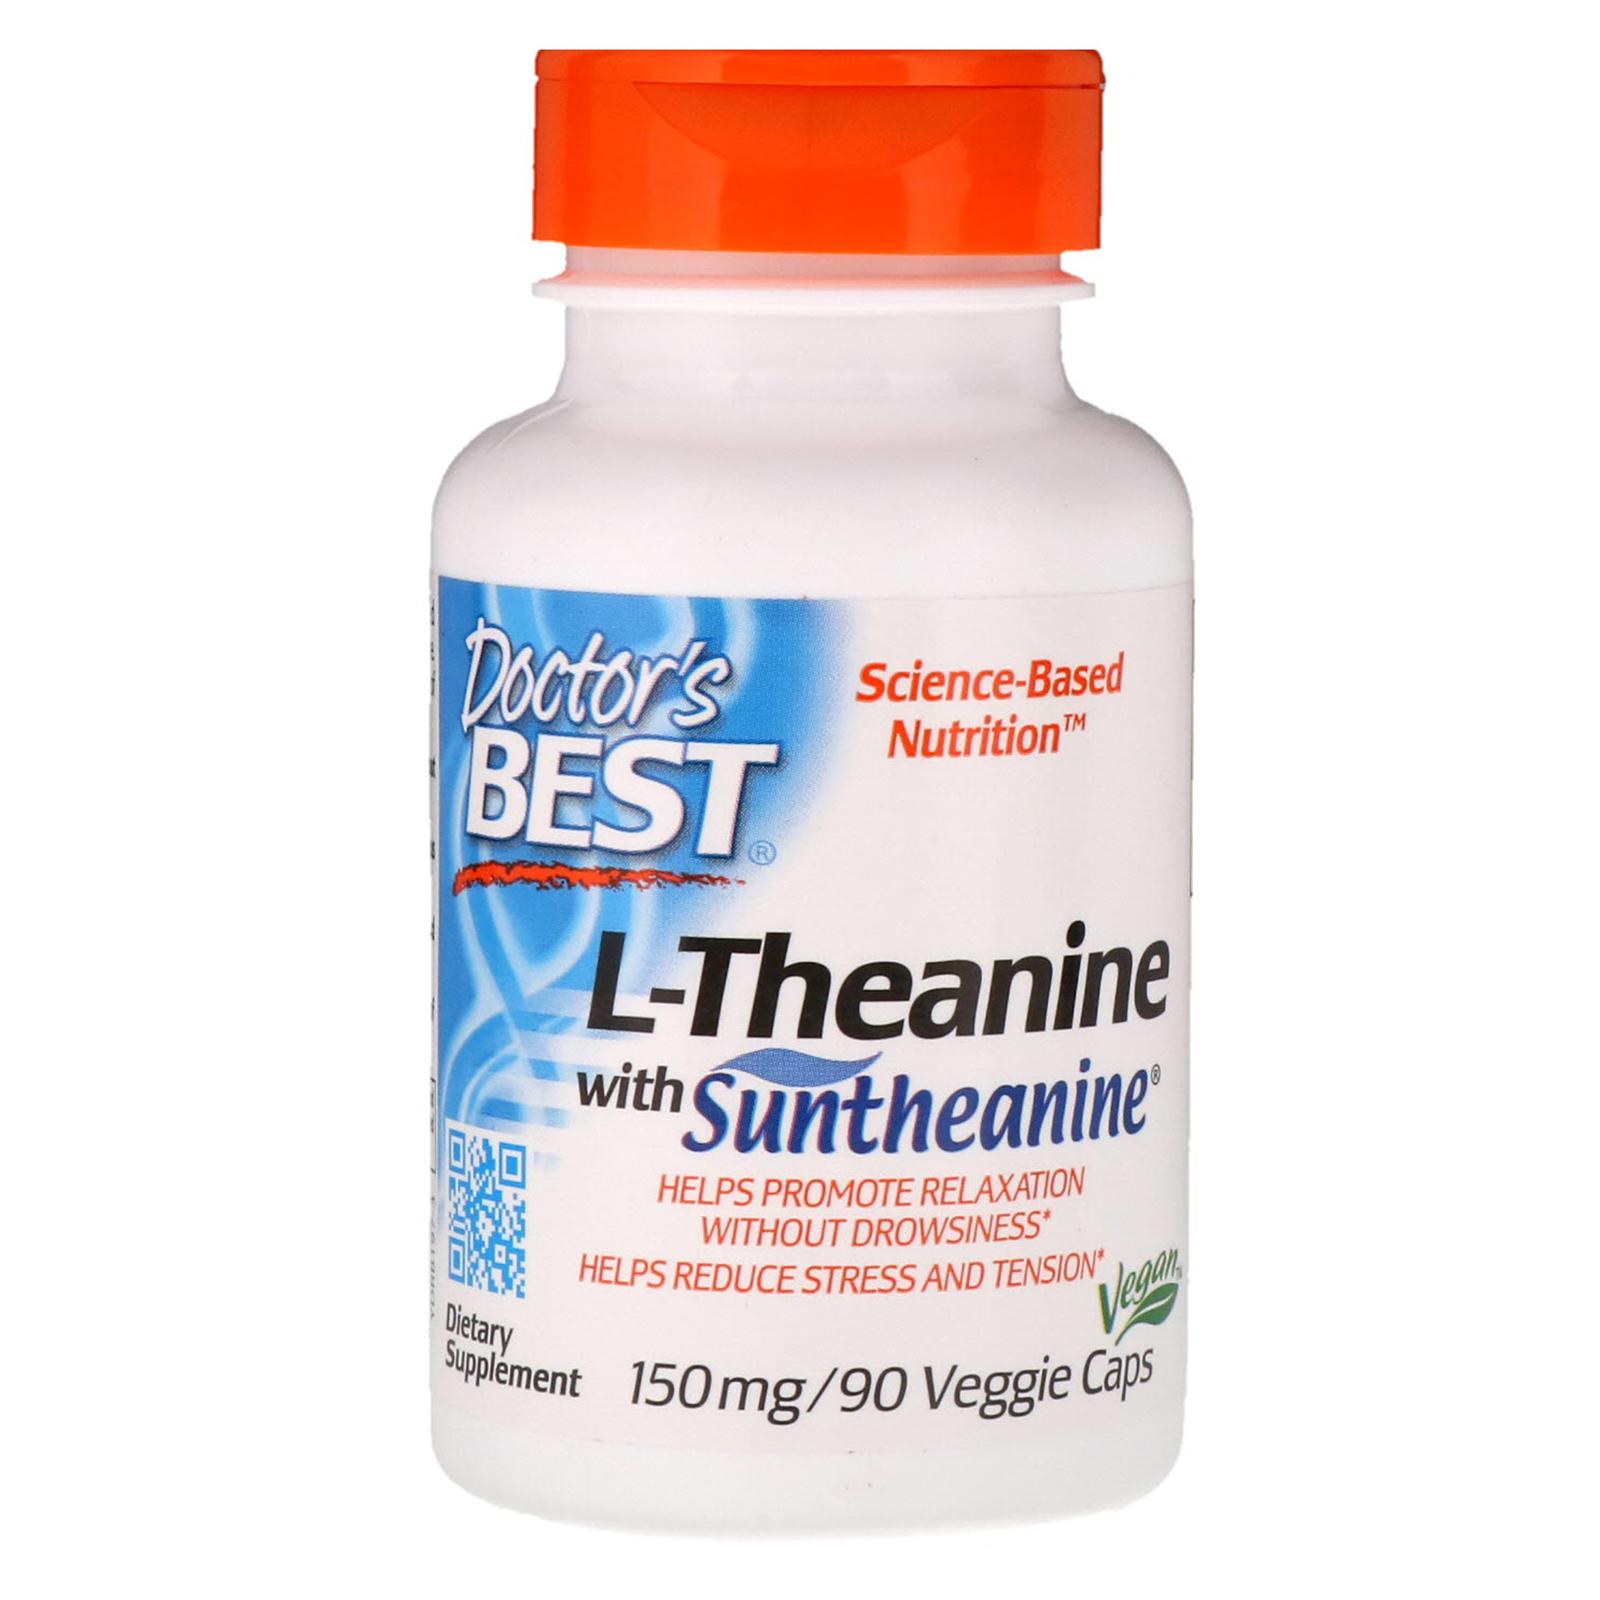 Doctor's Best, Suntheanine L-Theanine, 150 mg, 90 Veggie